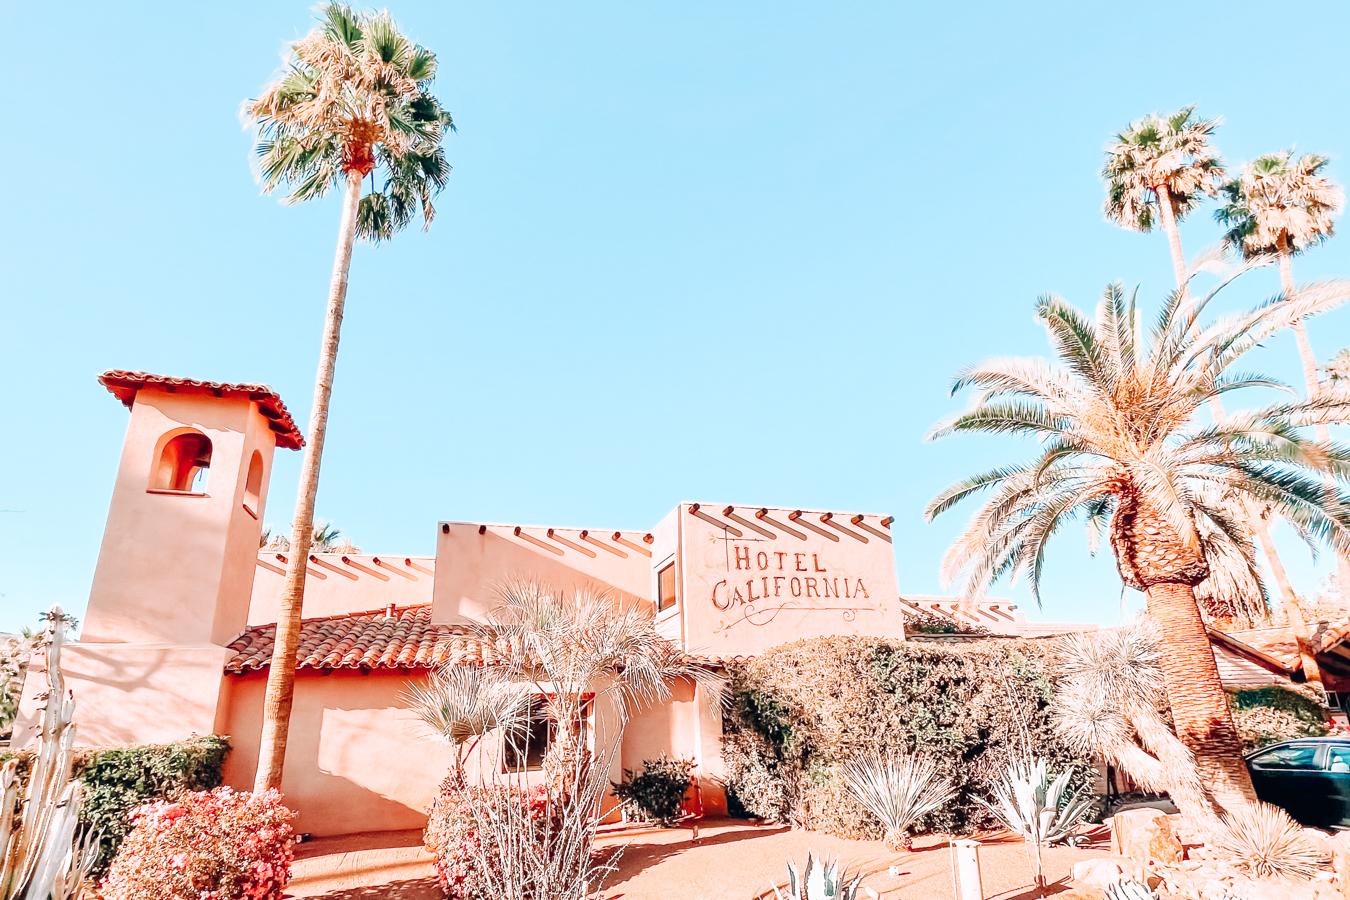 Hotel California in Palm Springs